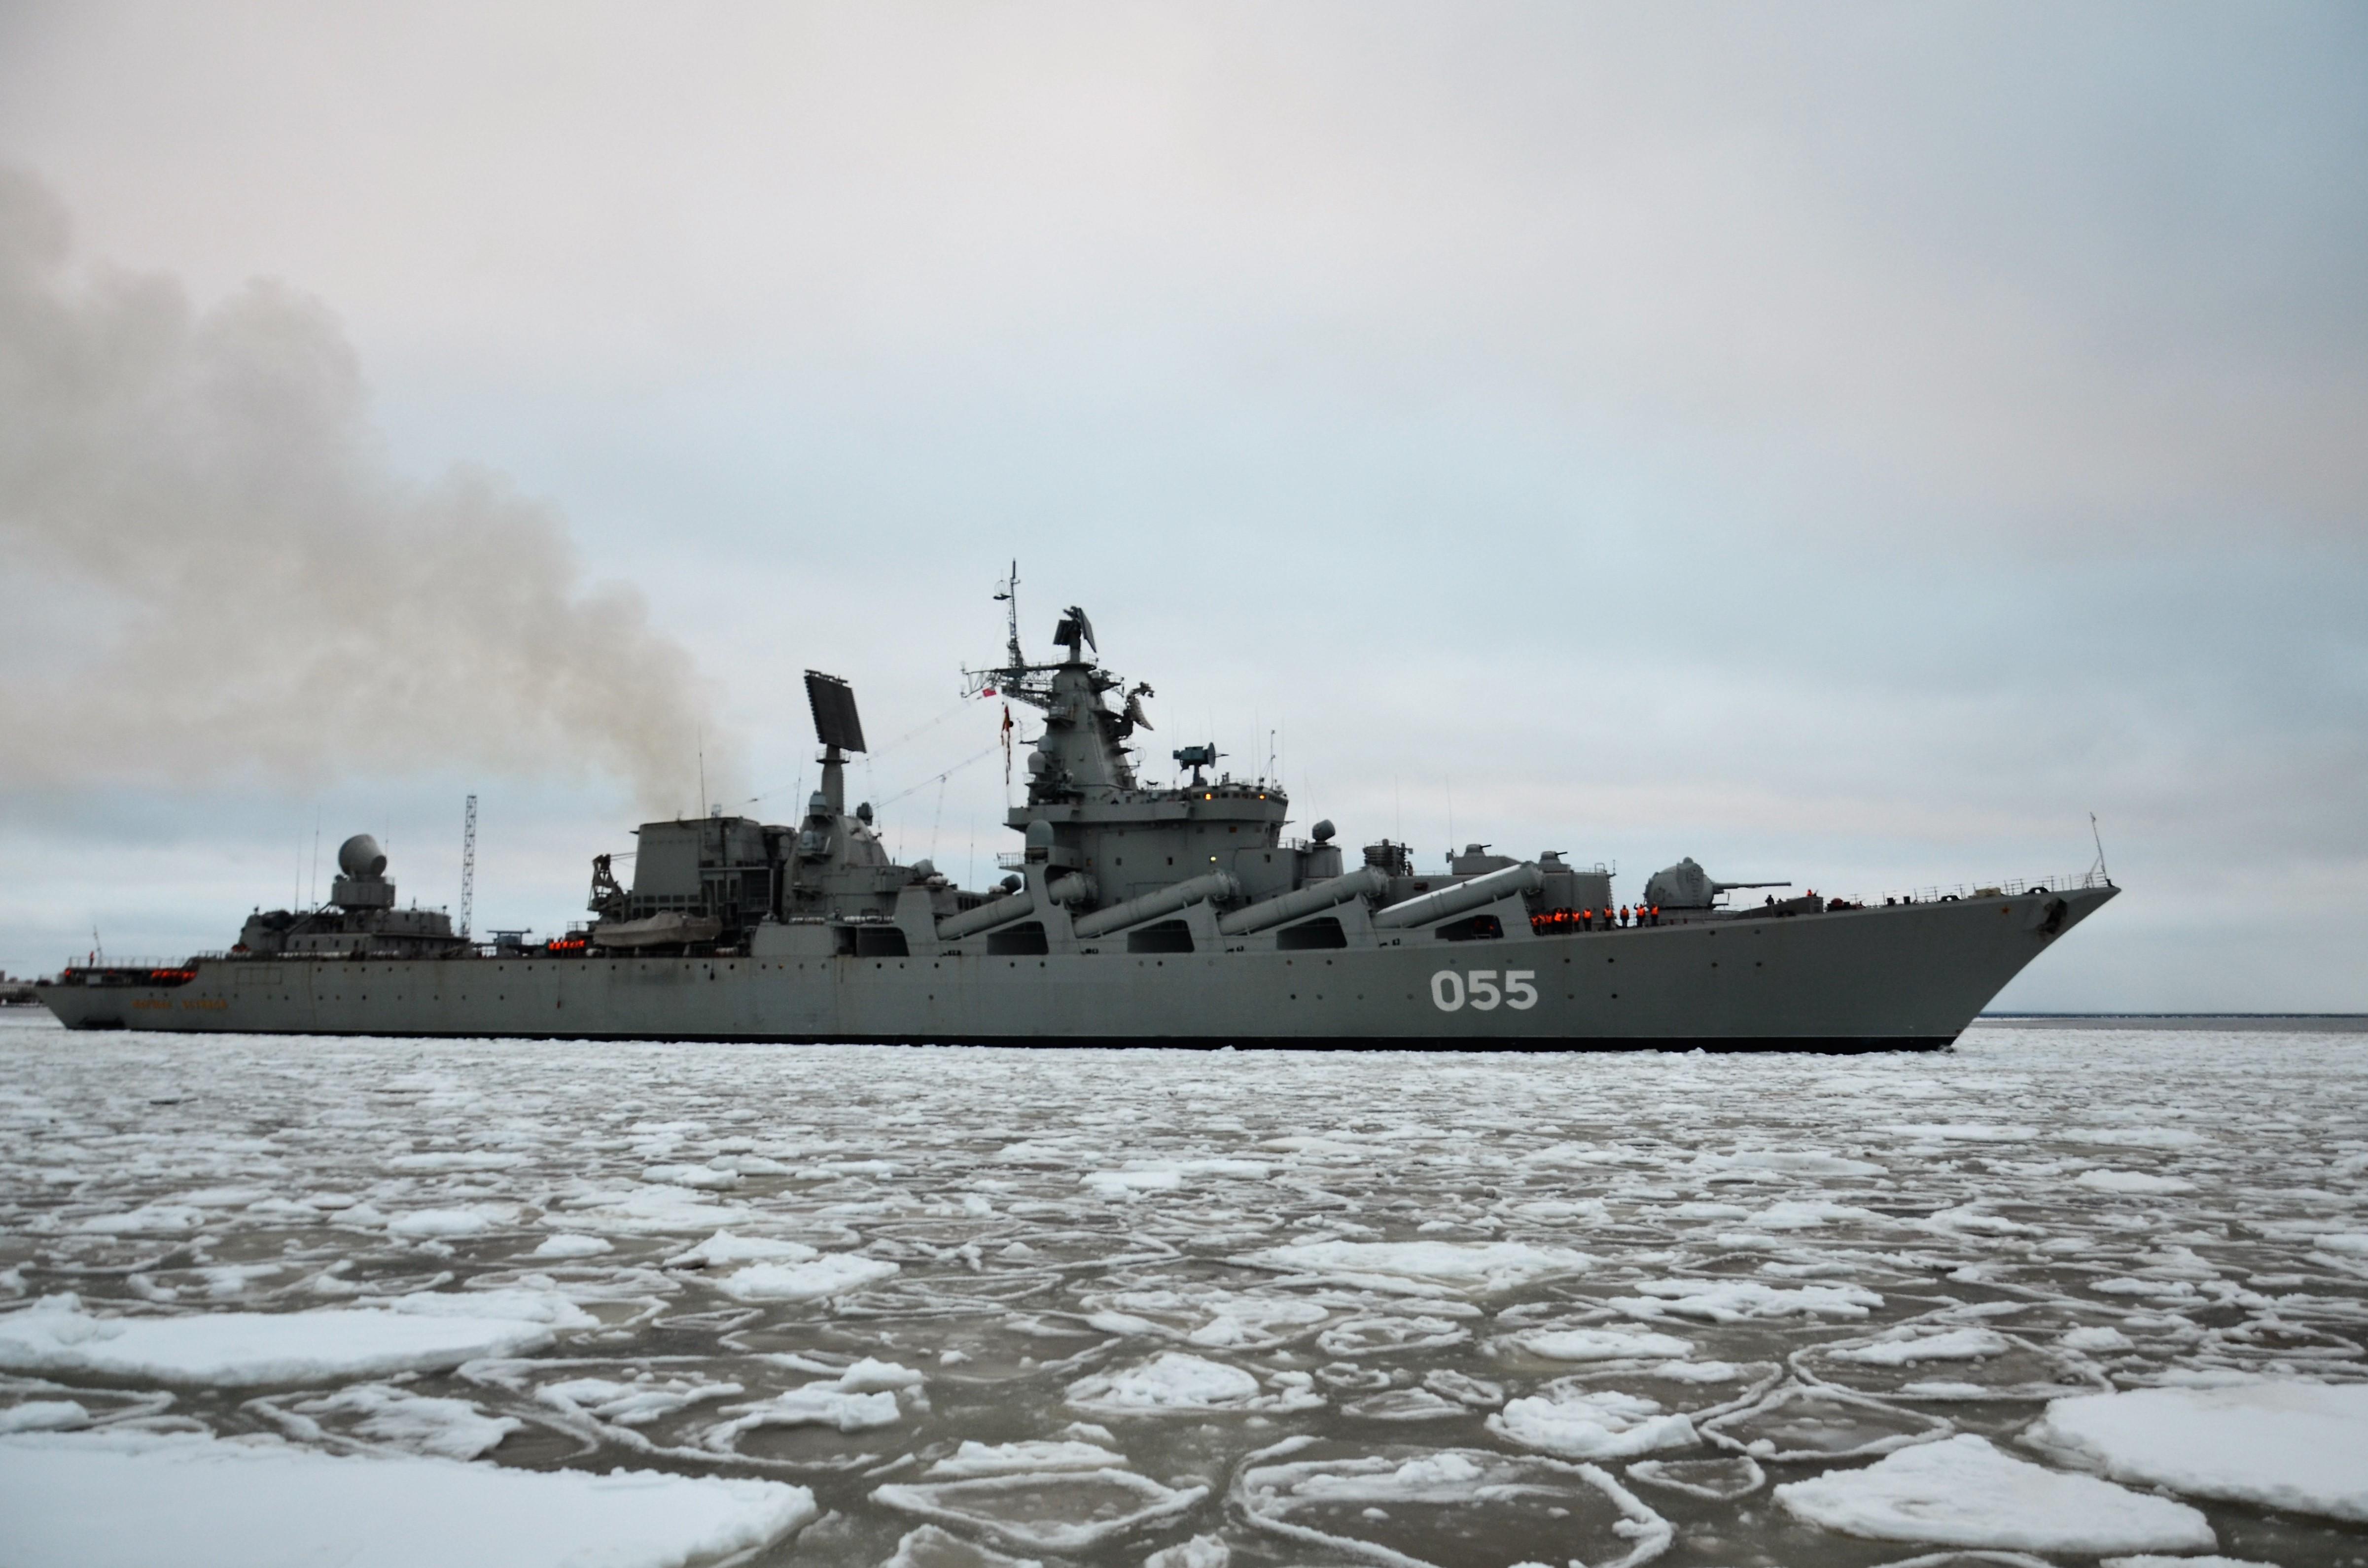 Project 1164 Atlant: Slava Class cruiser - Page 7 30-4454325-dsc-9692-2-